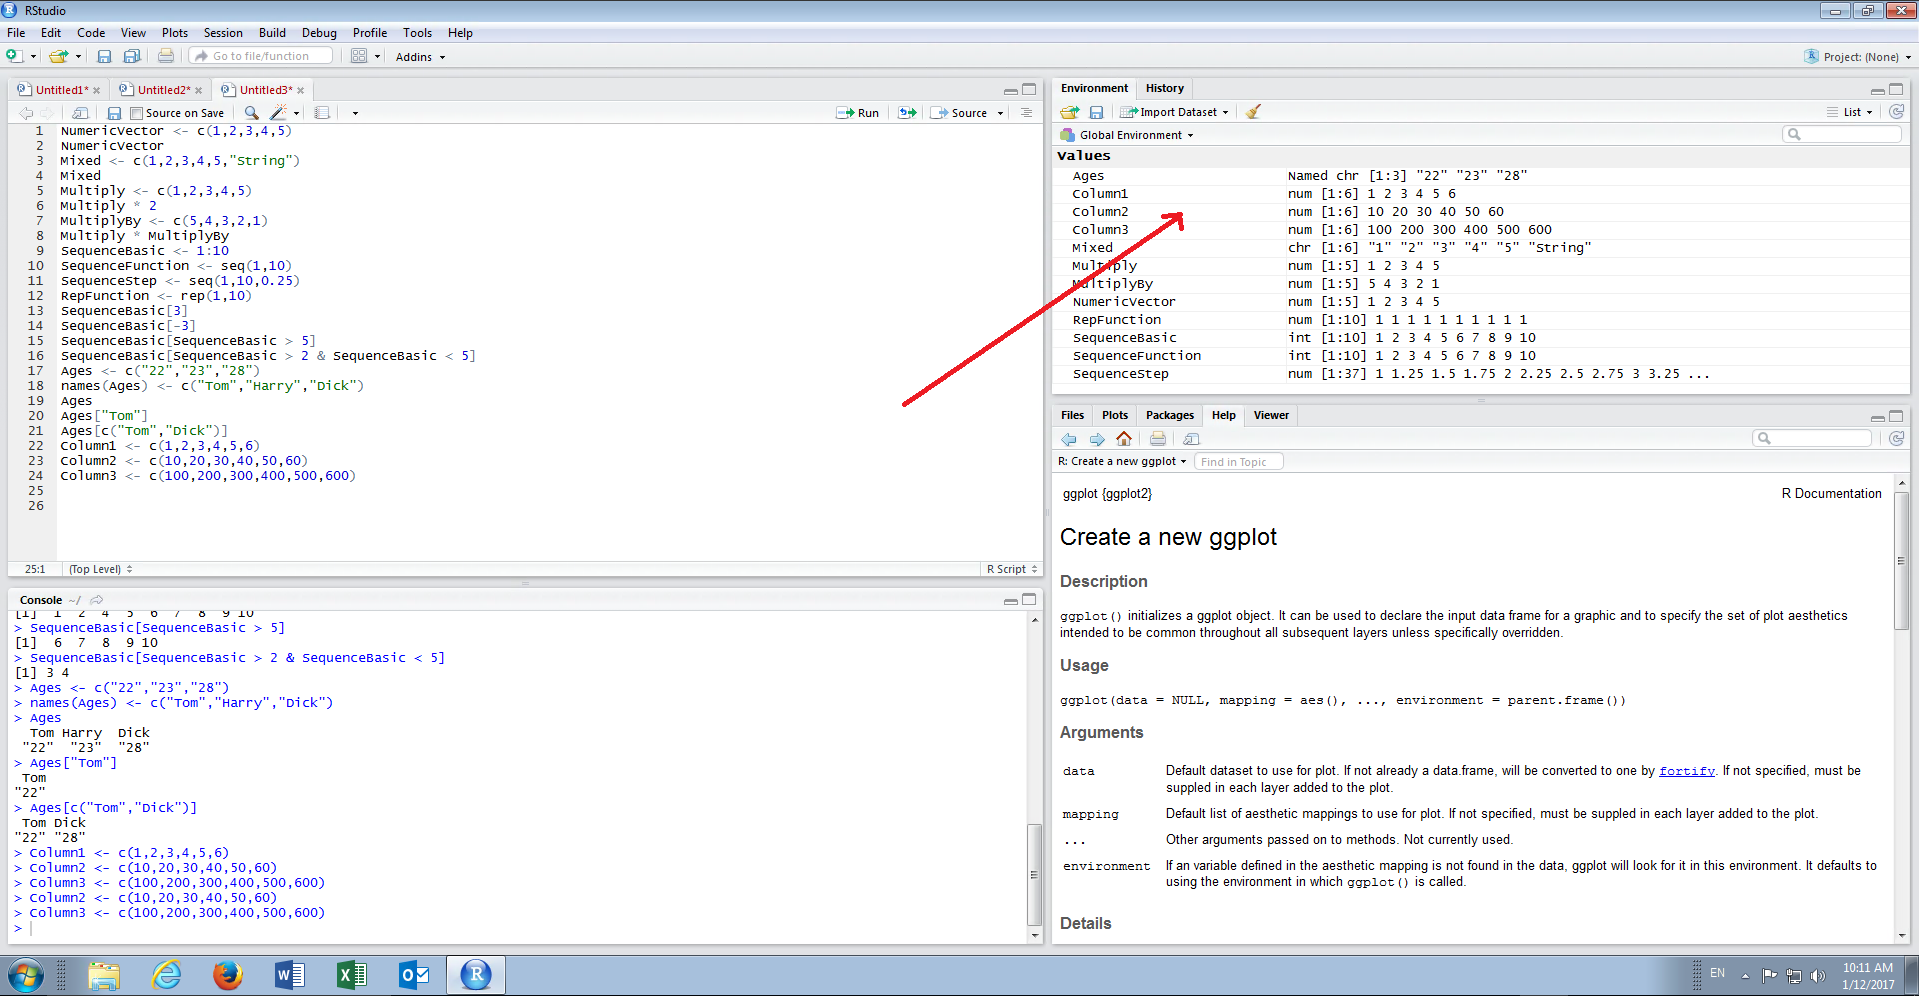 vectors-of-same-length-in-rstudio-environment.png